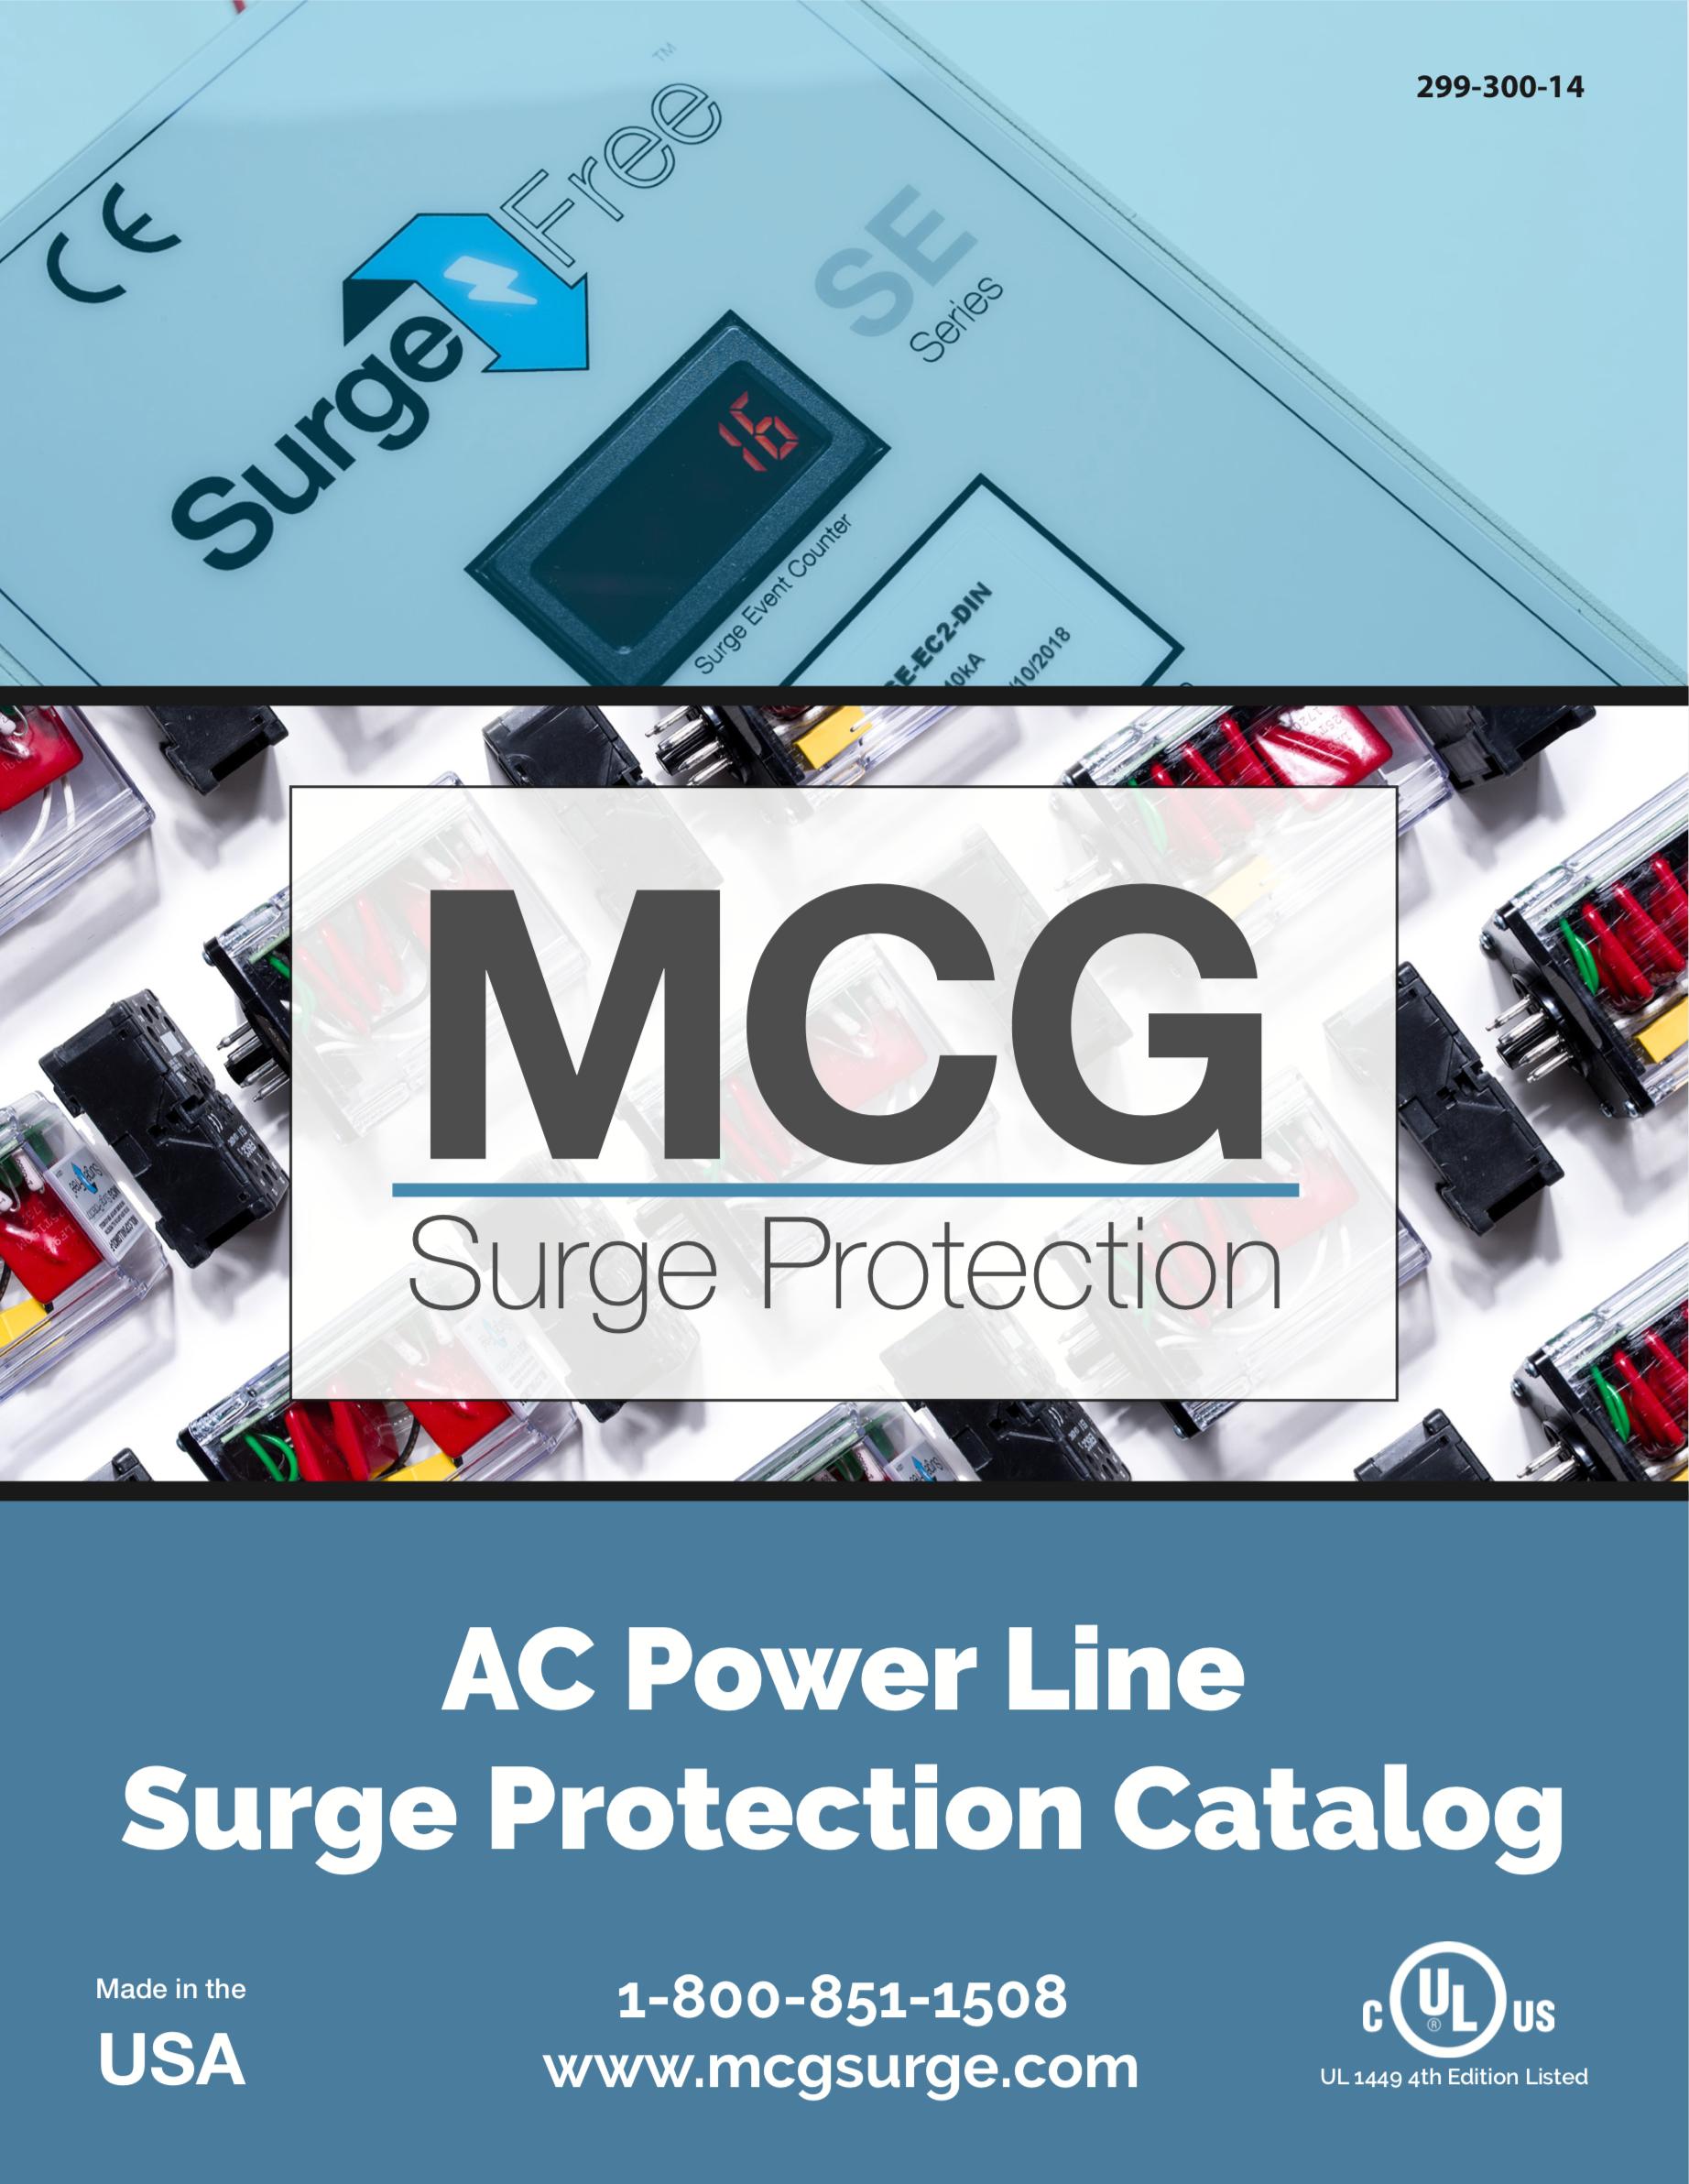 AC Power Line